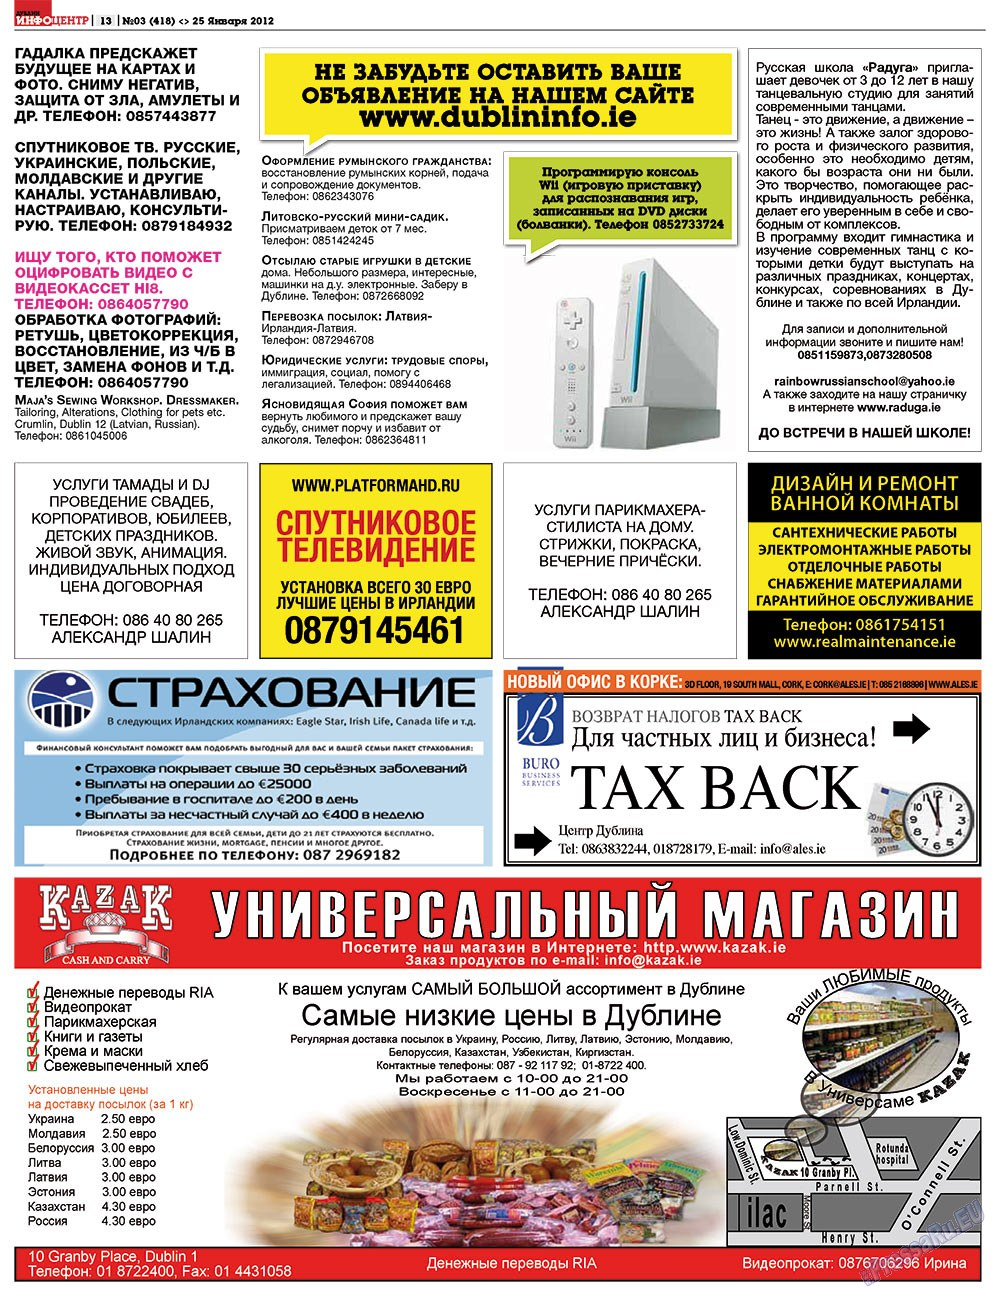 Дублин инфоцентр (газета). 2012 год, номер 3, стр. 13